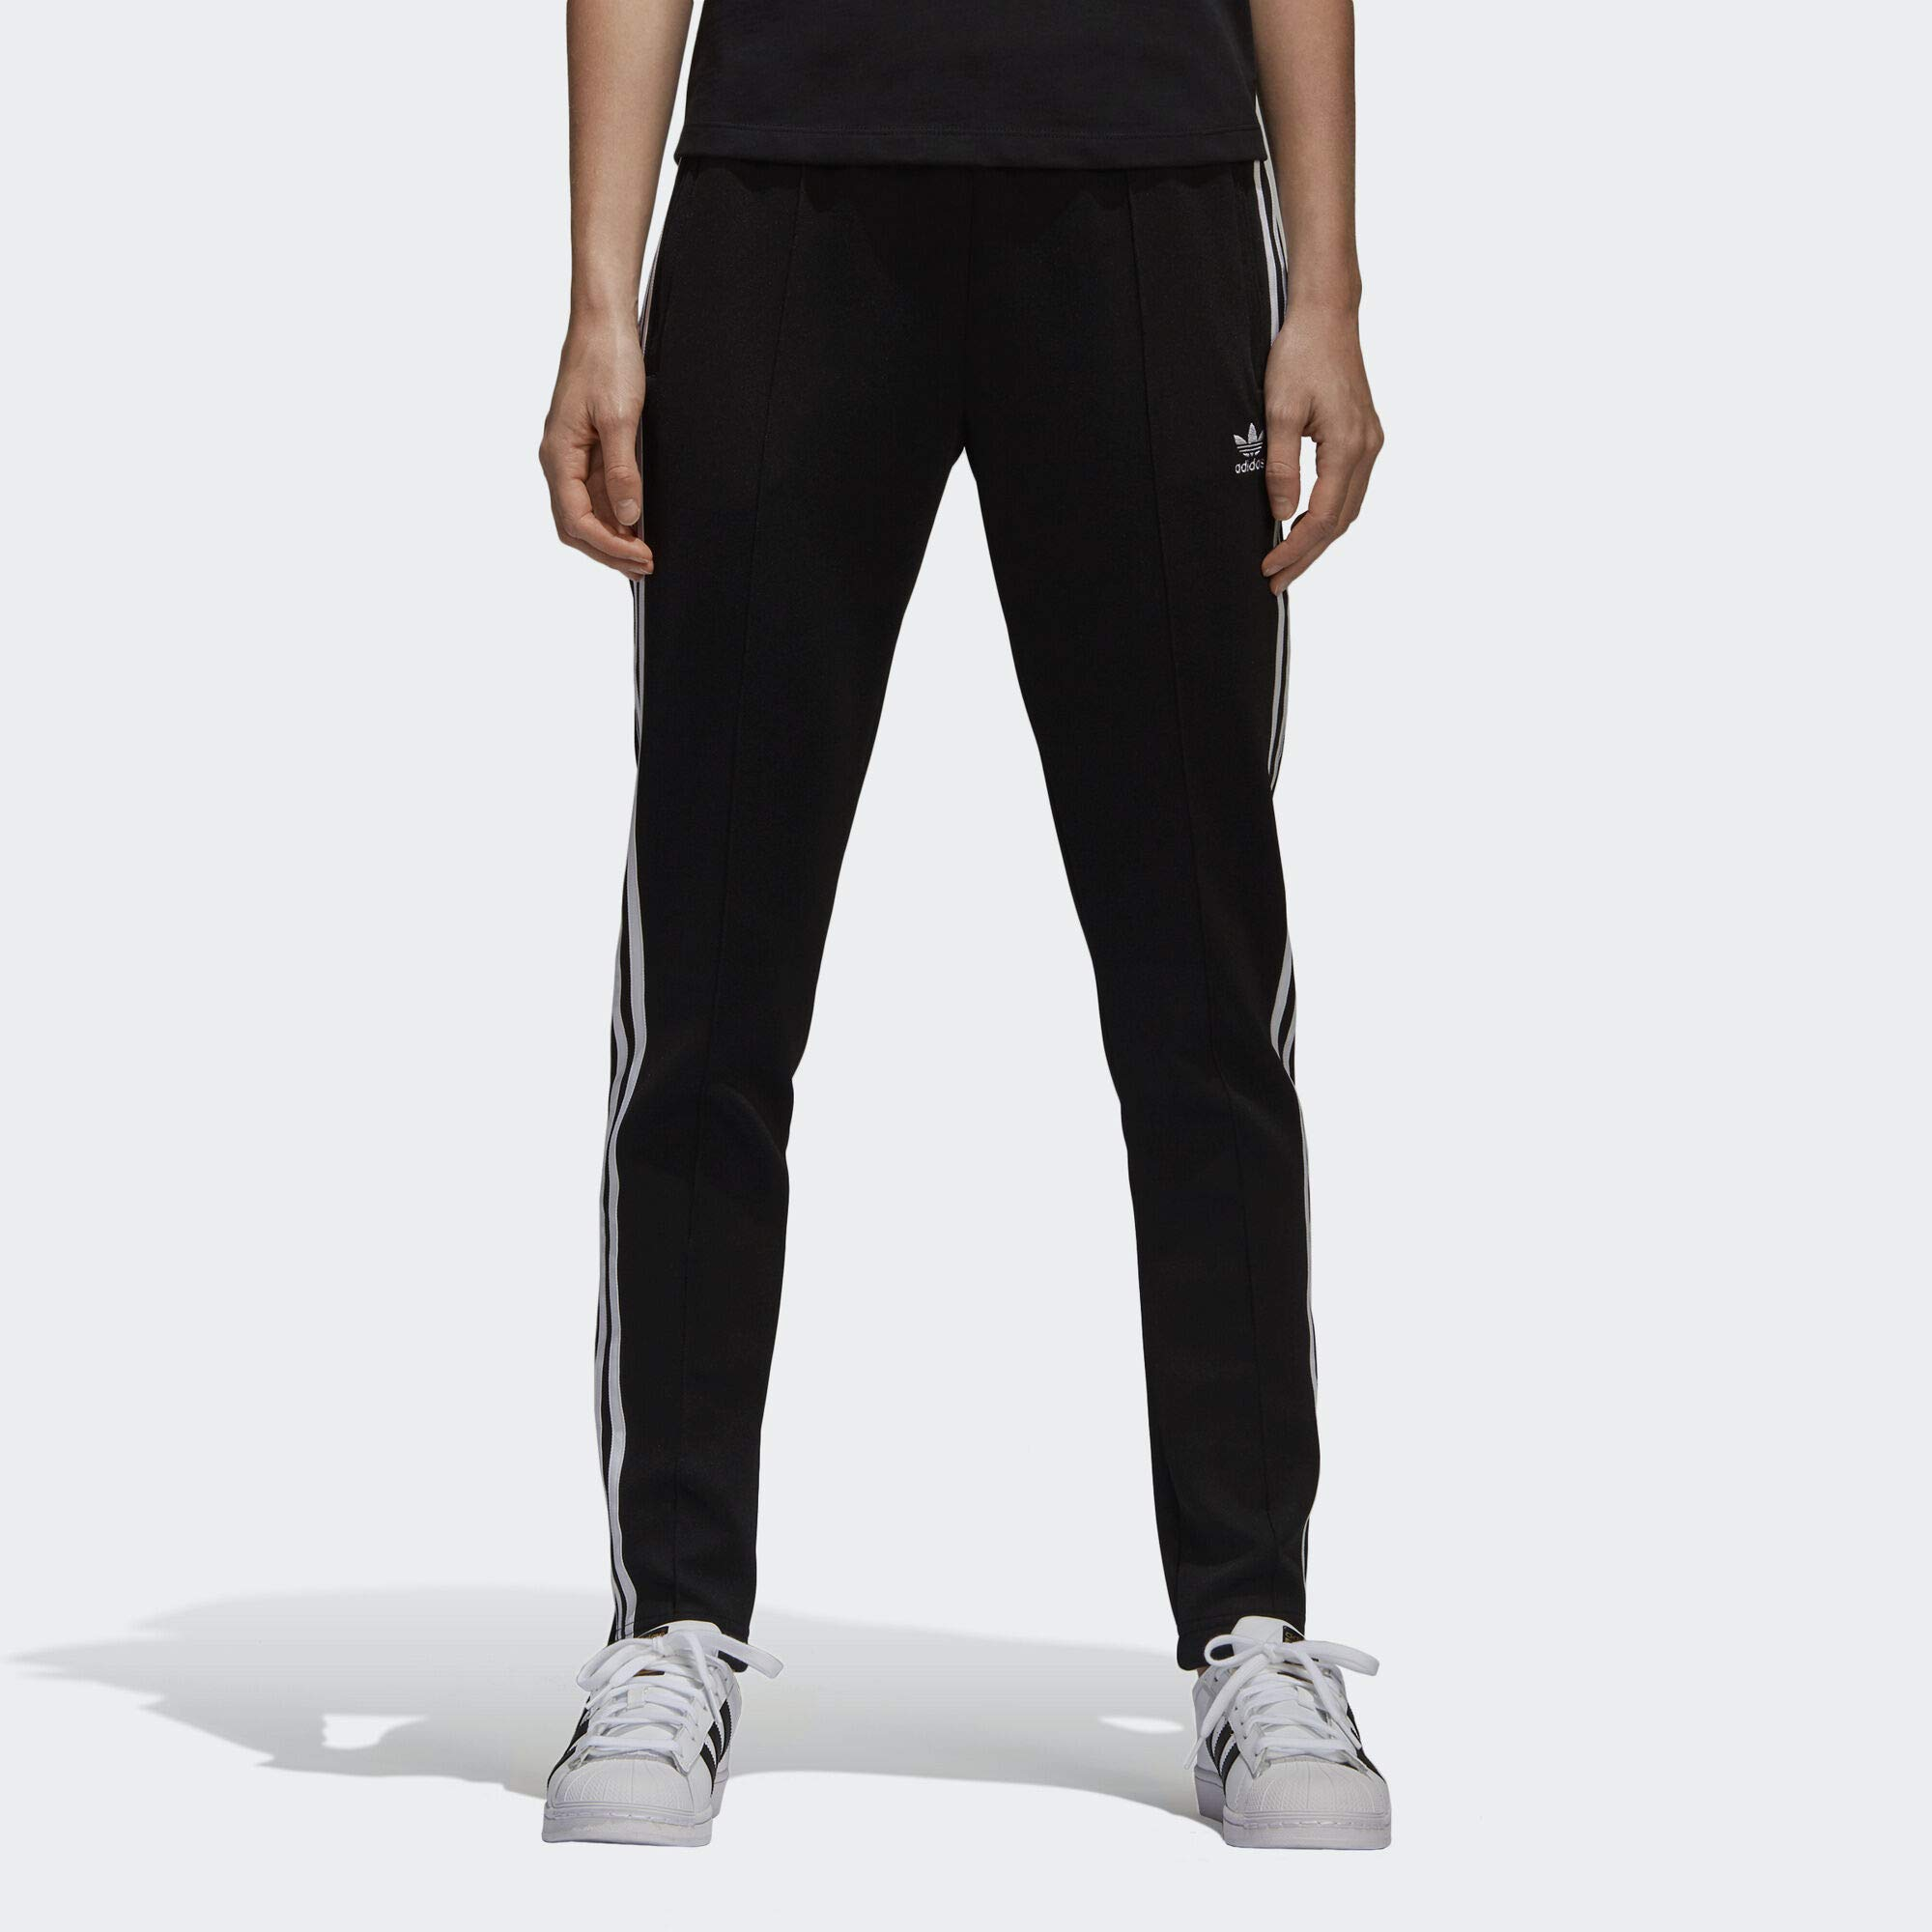 adidas Women's Superstar Trackpant, Black, M by adidas Originals